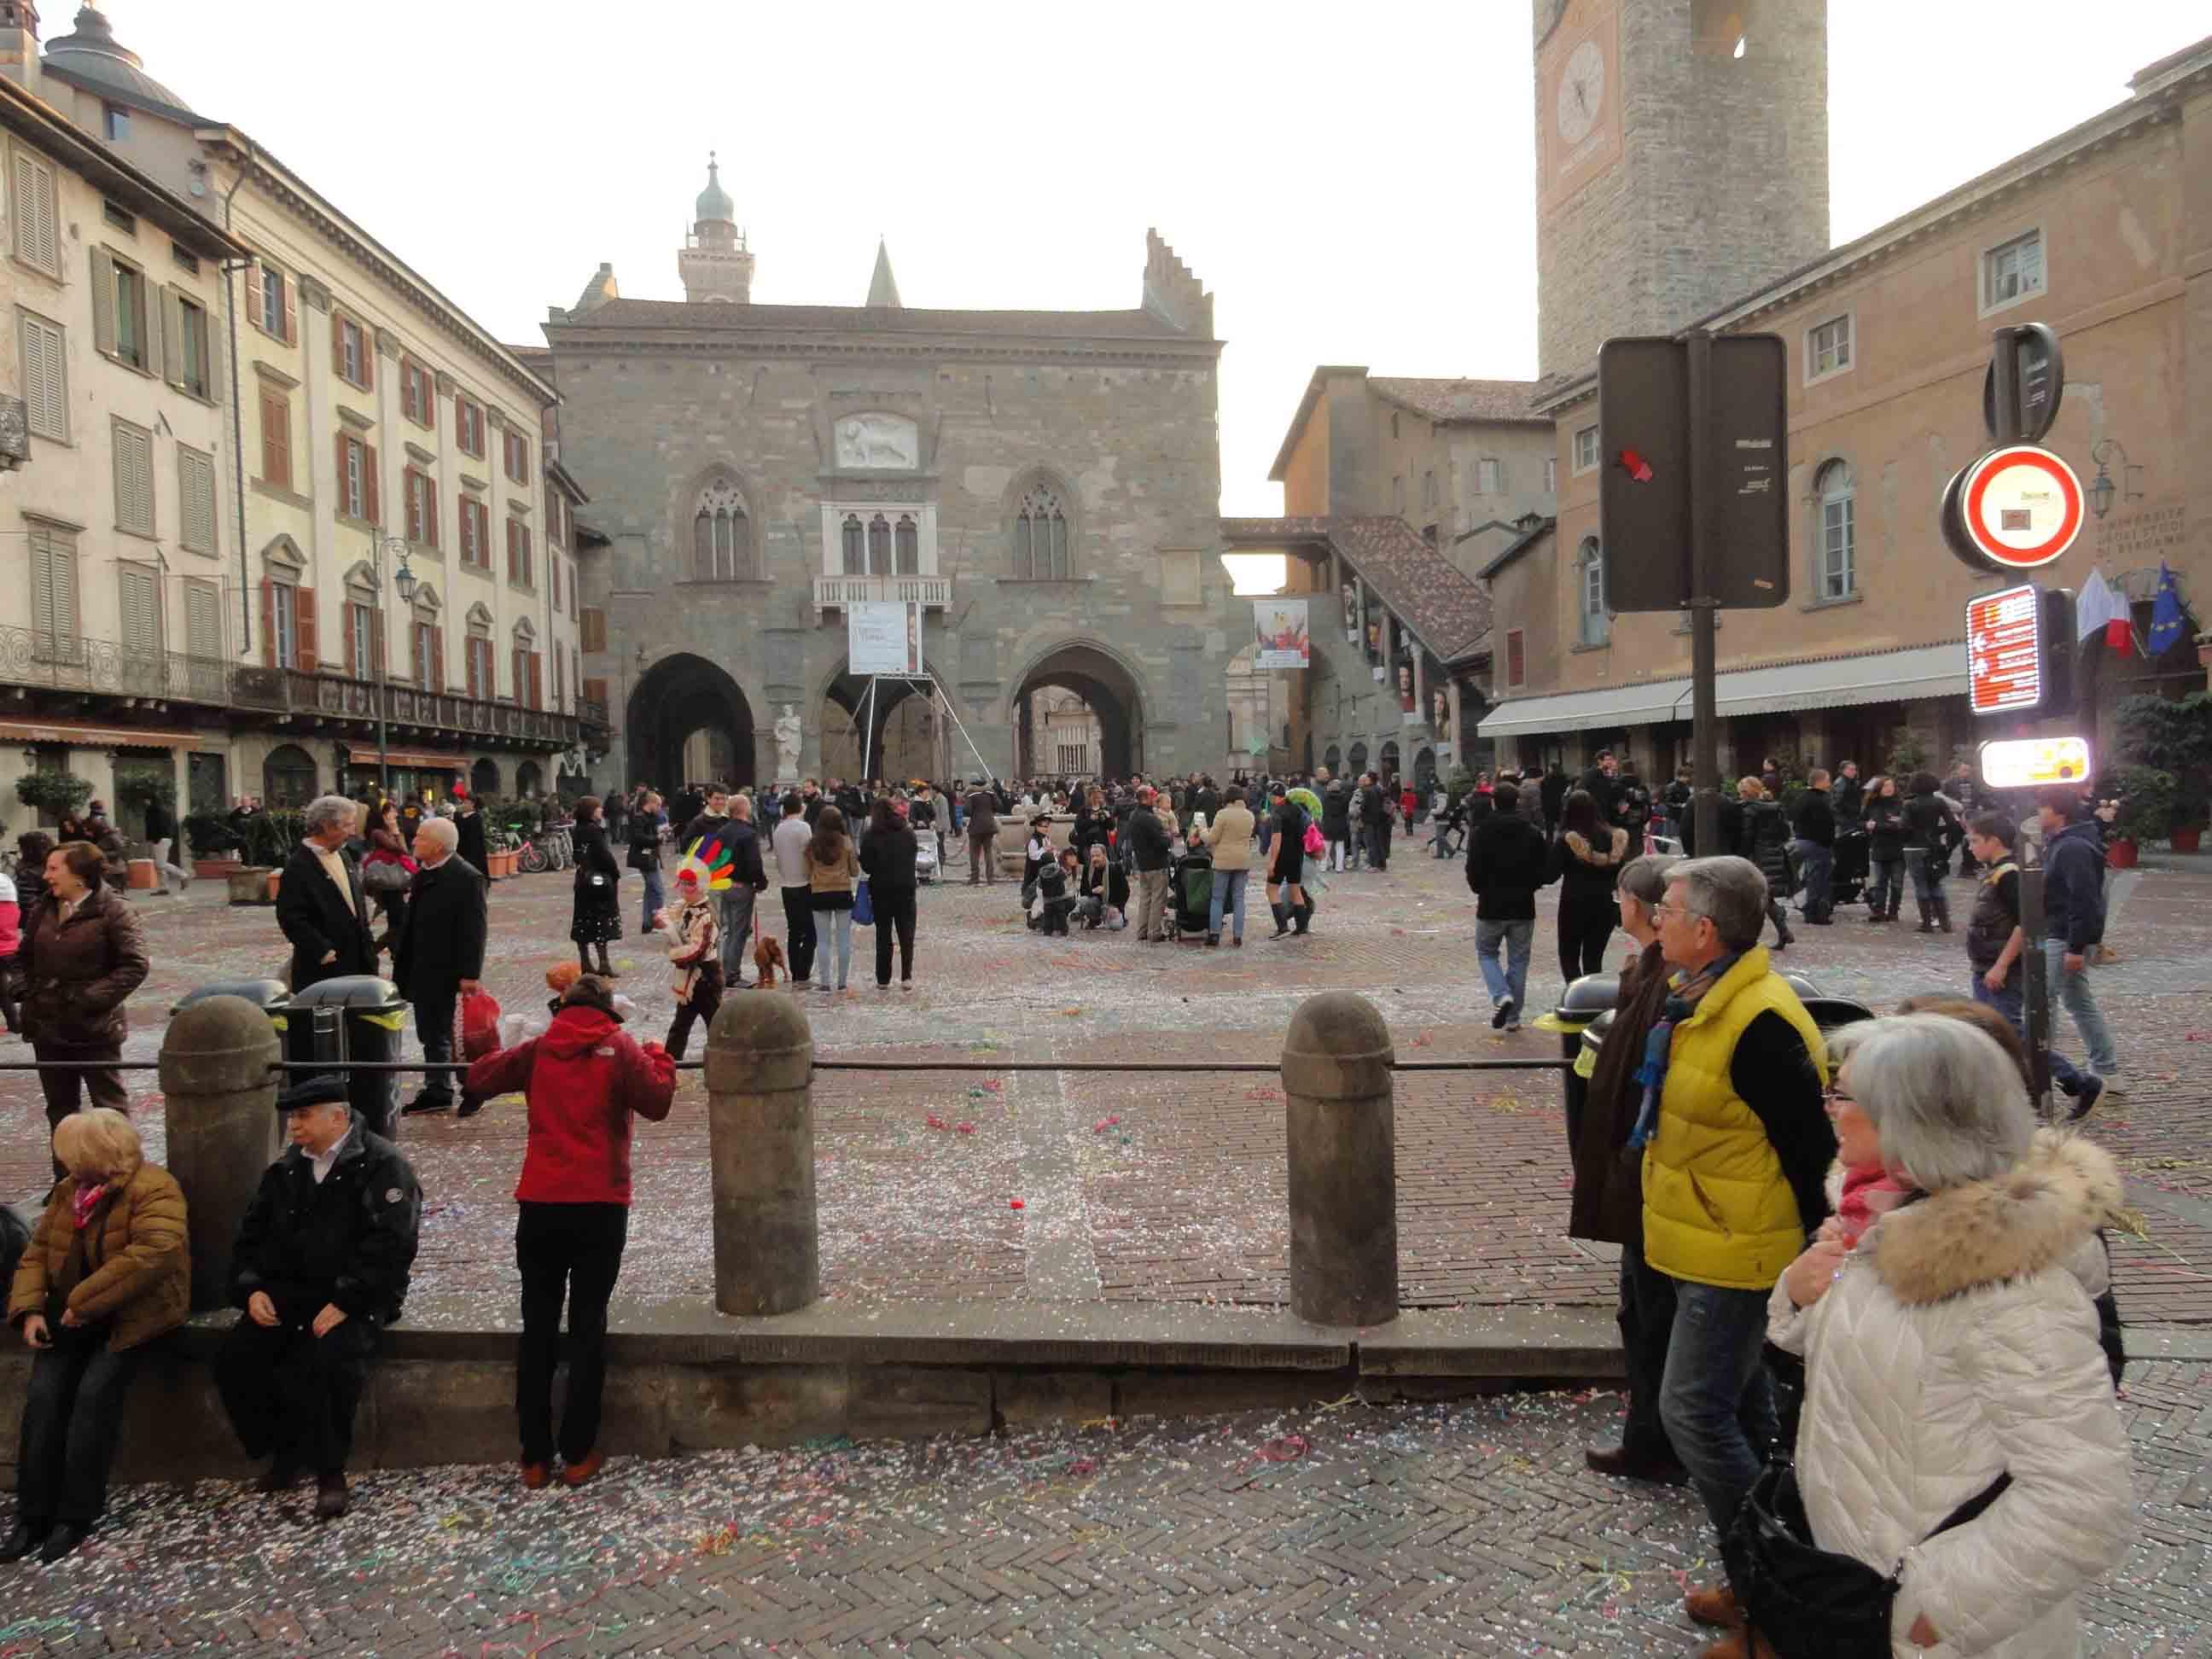 Turismo, nasce la Bergamo Card